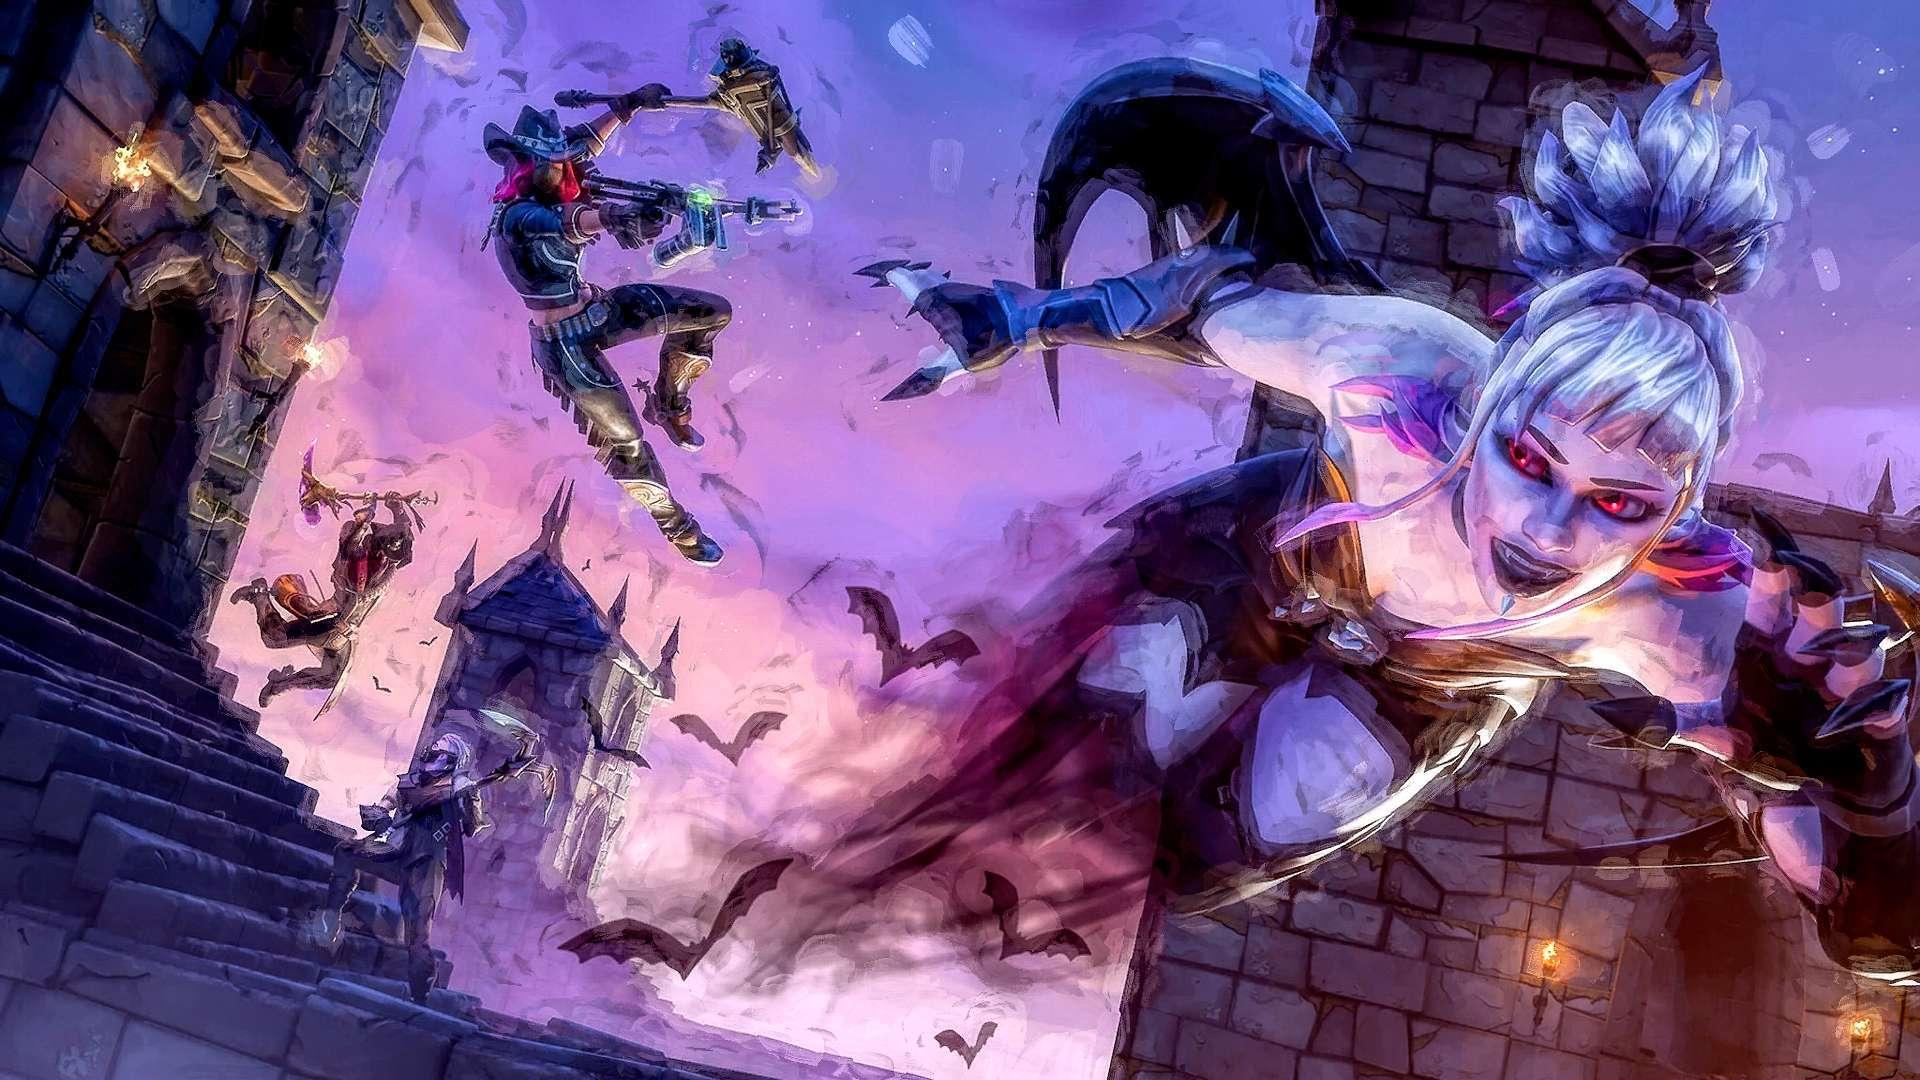 Fortnite Anime Wallpapers   Top Fortnite Anime Backgrounds 1920x1080